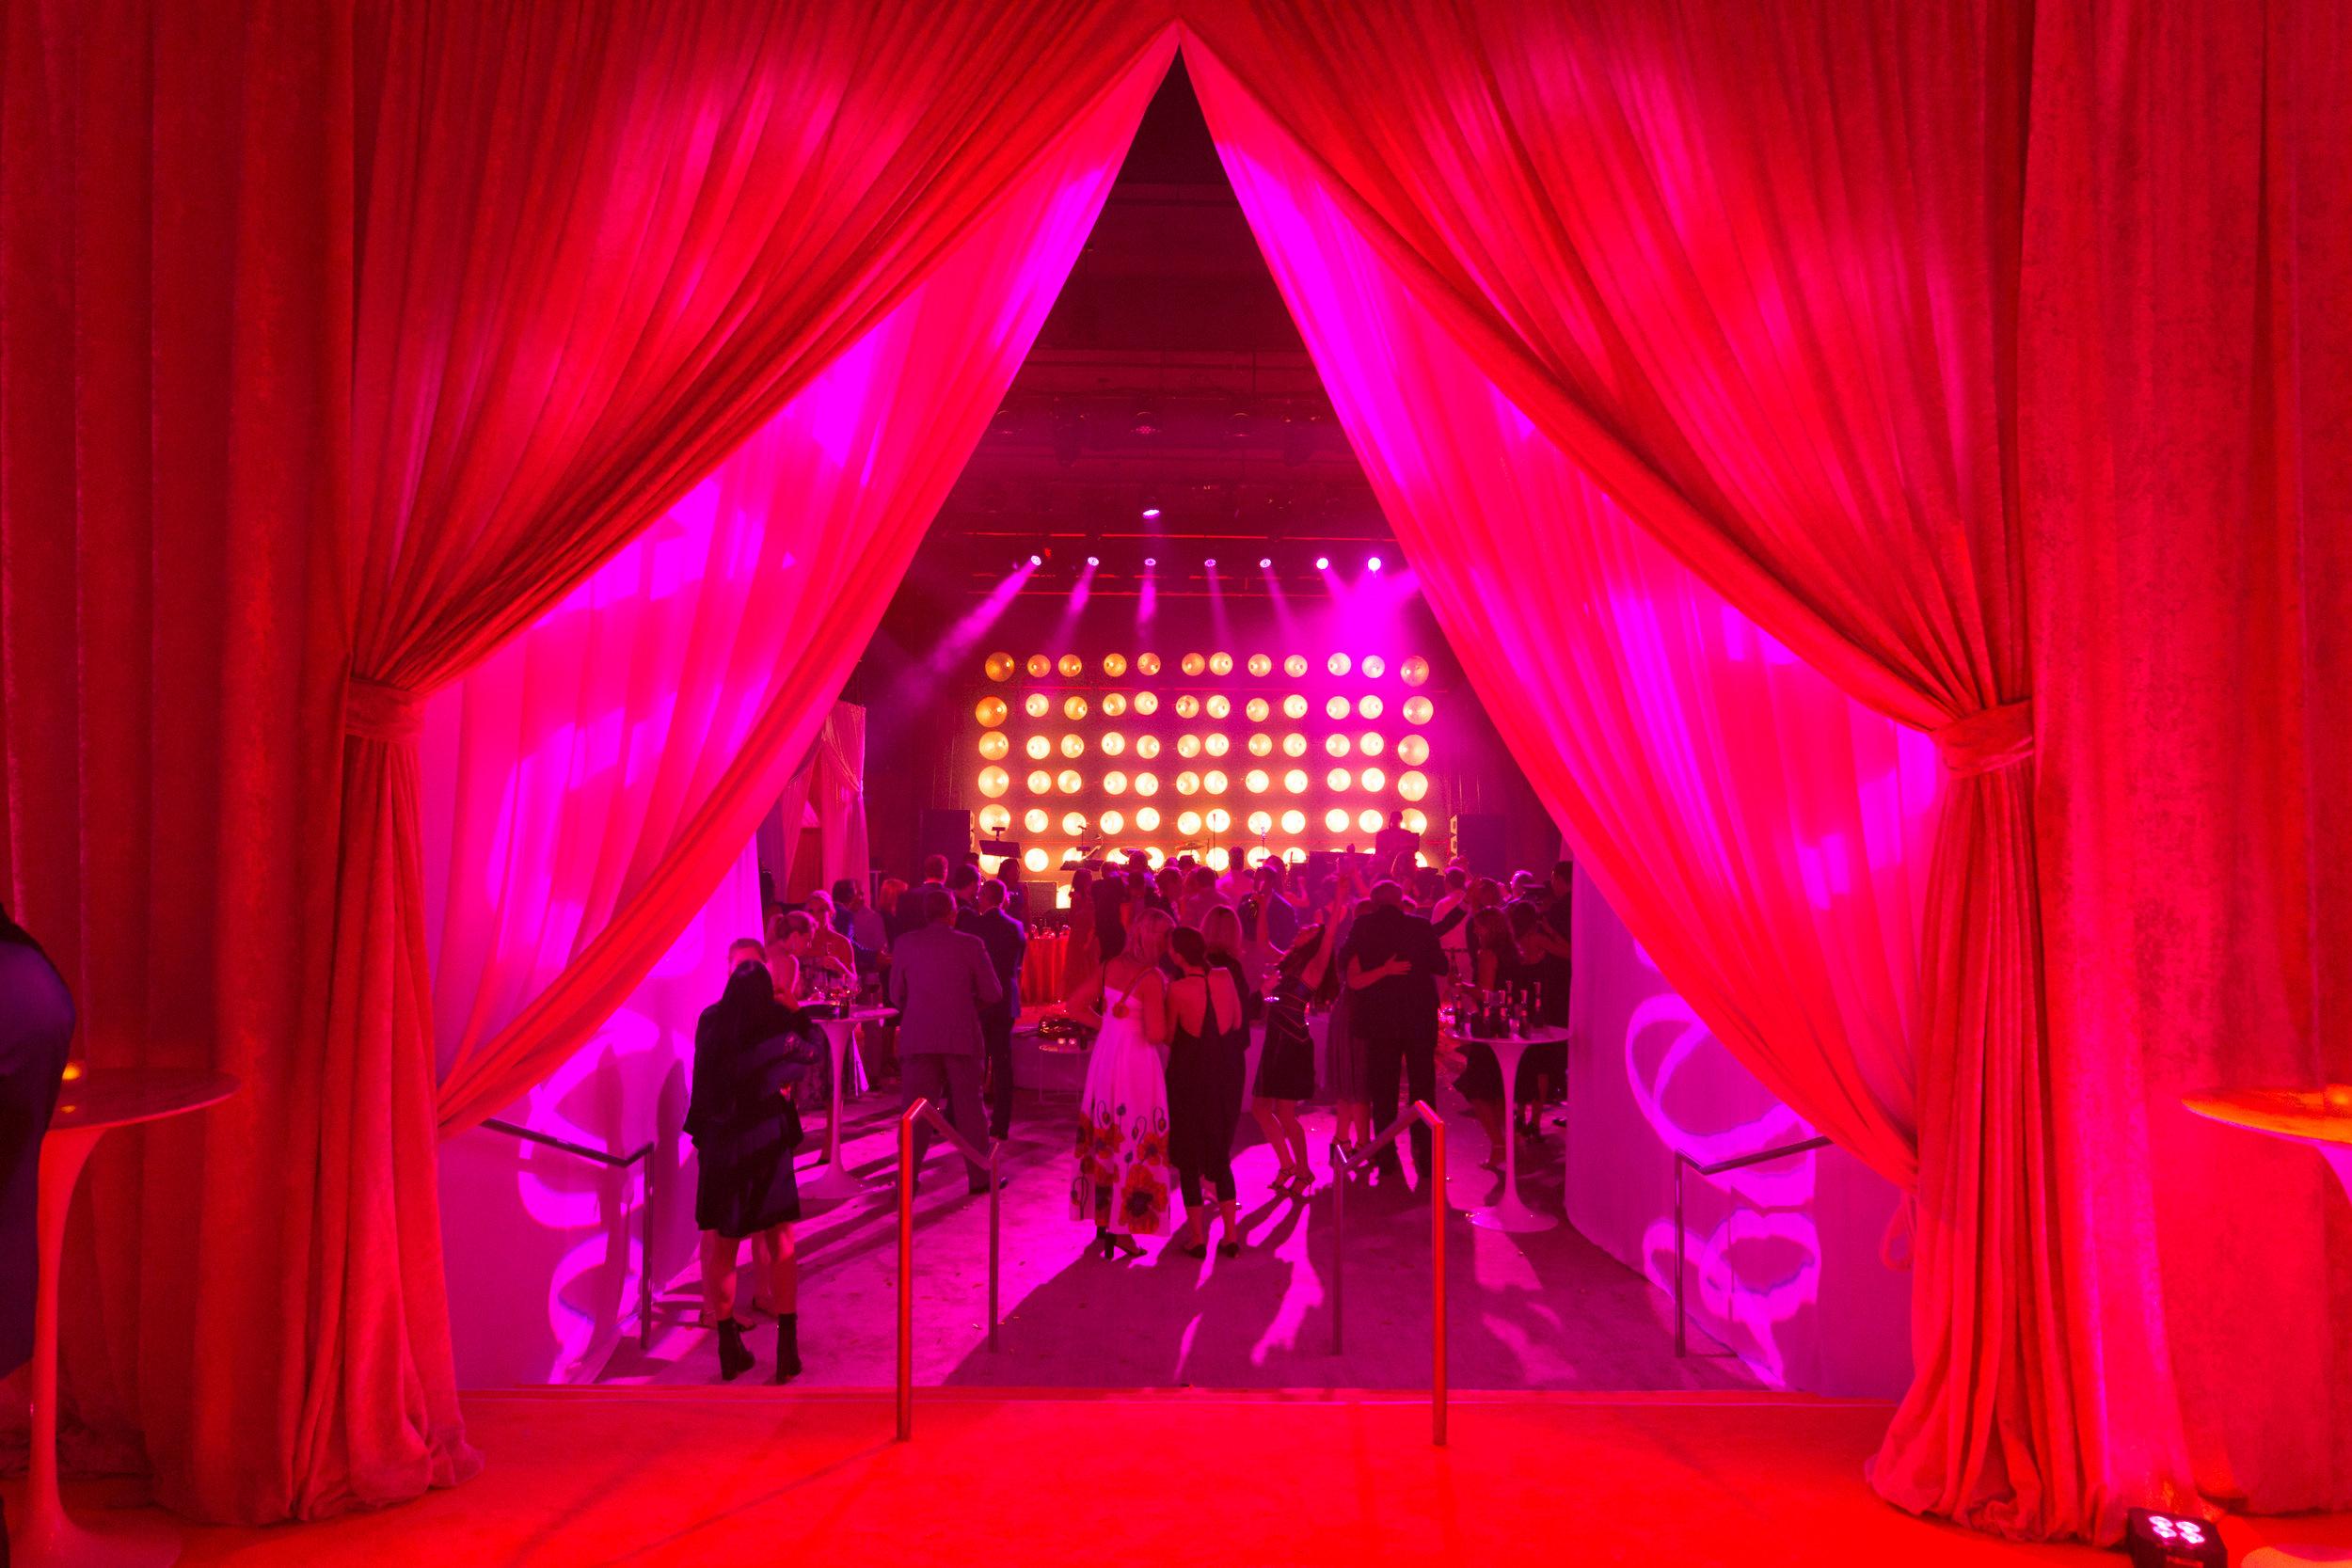 Rafanelli Events Drape VIgnettes Port Lighting Systems.jpg